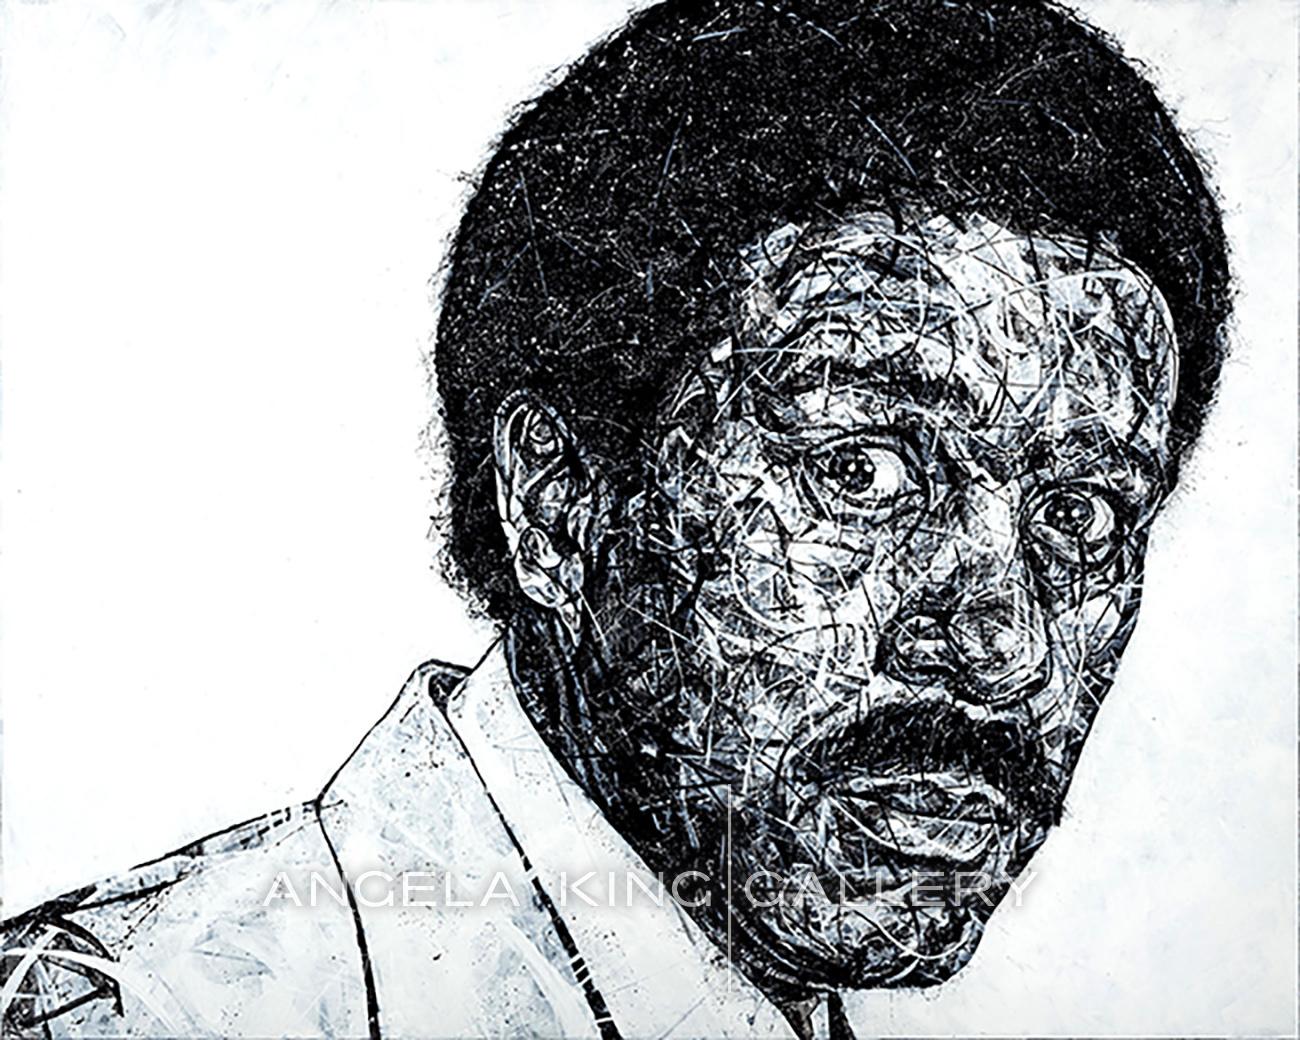 Portrait of Richard Pryor